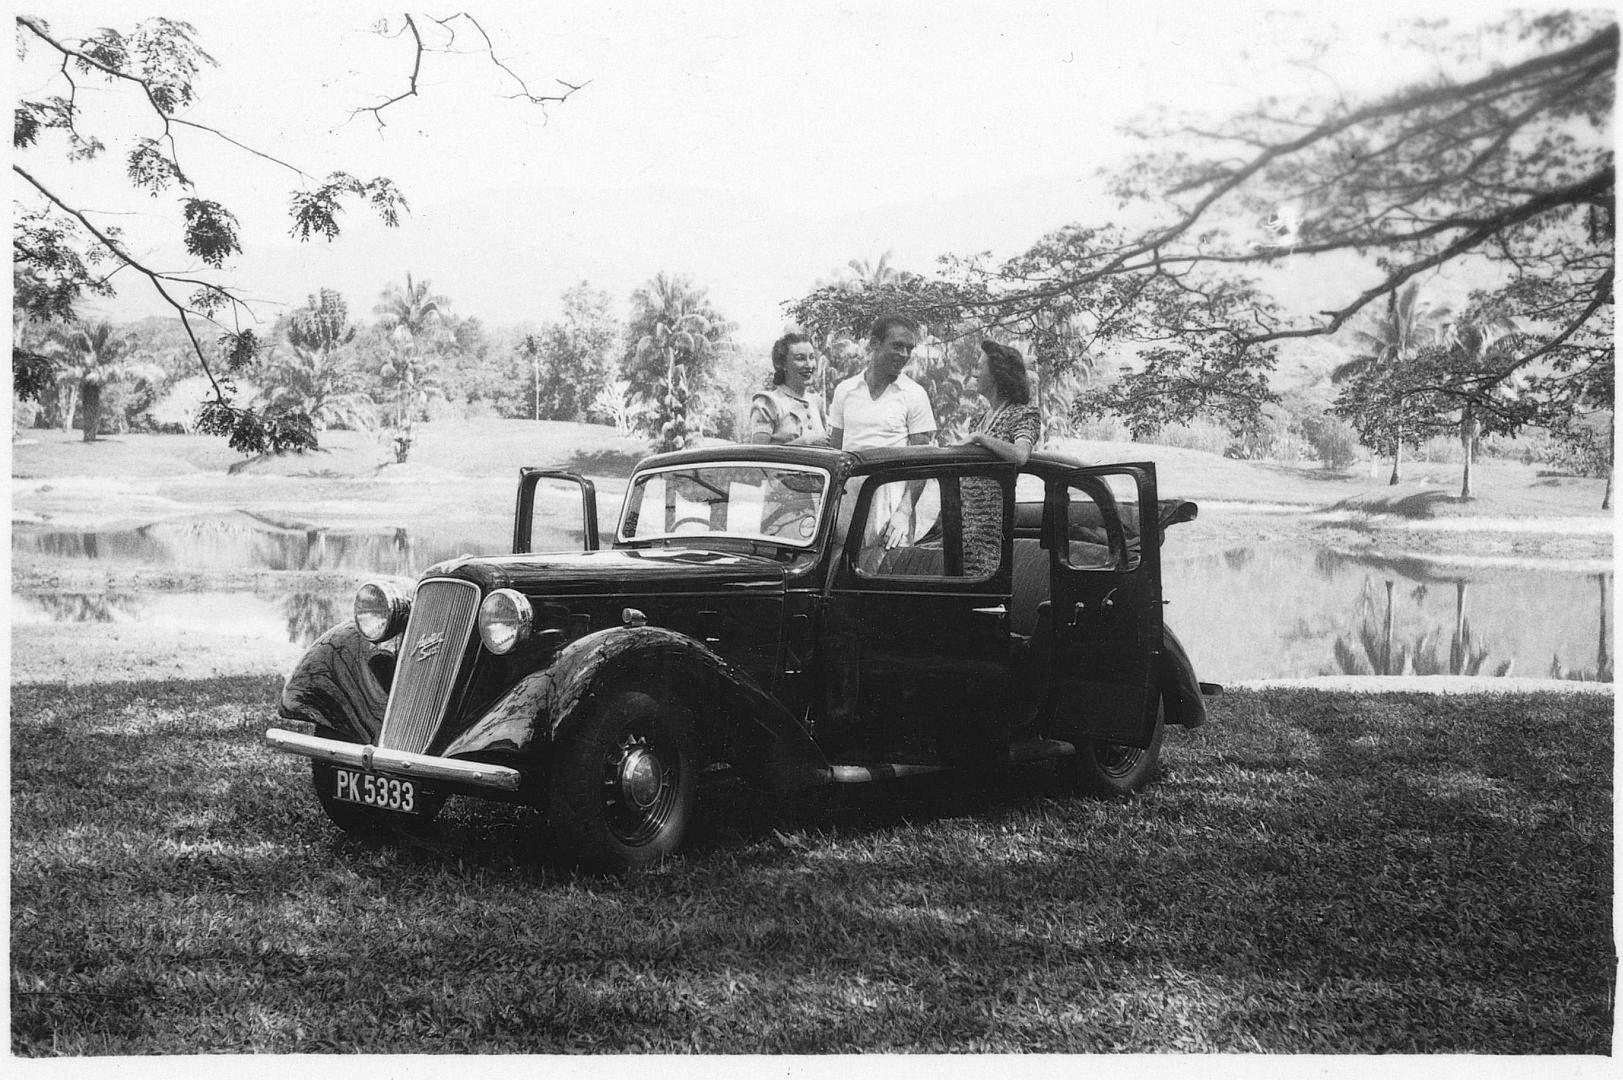 Austin_12-6_1937_open-top_sedan_Galerie